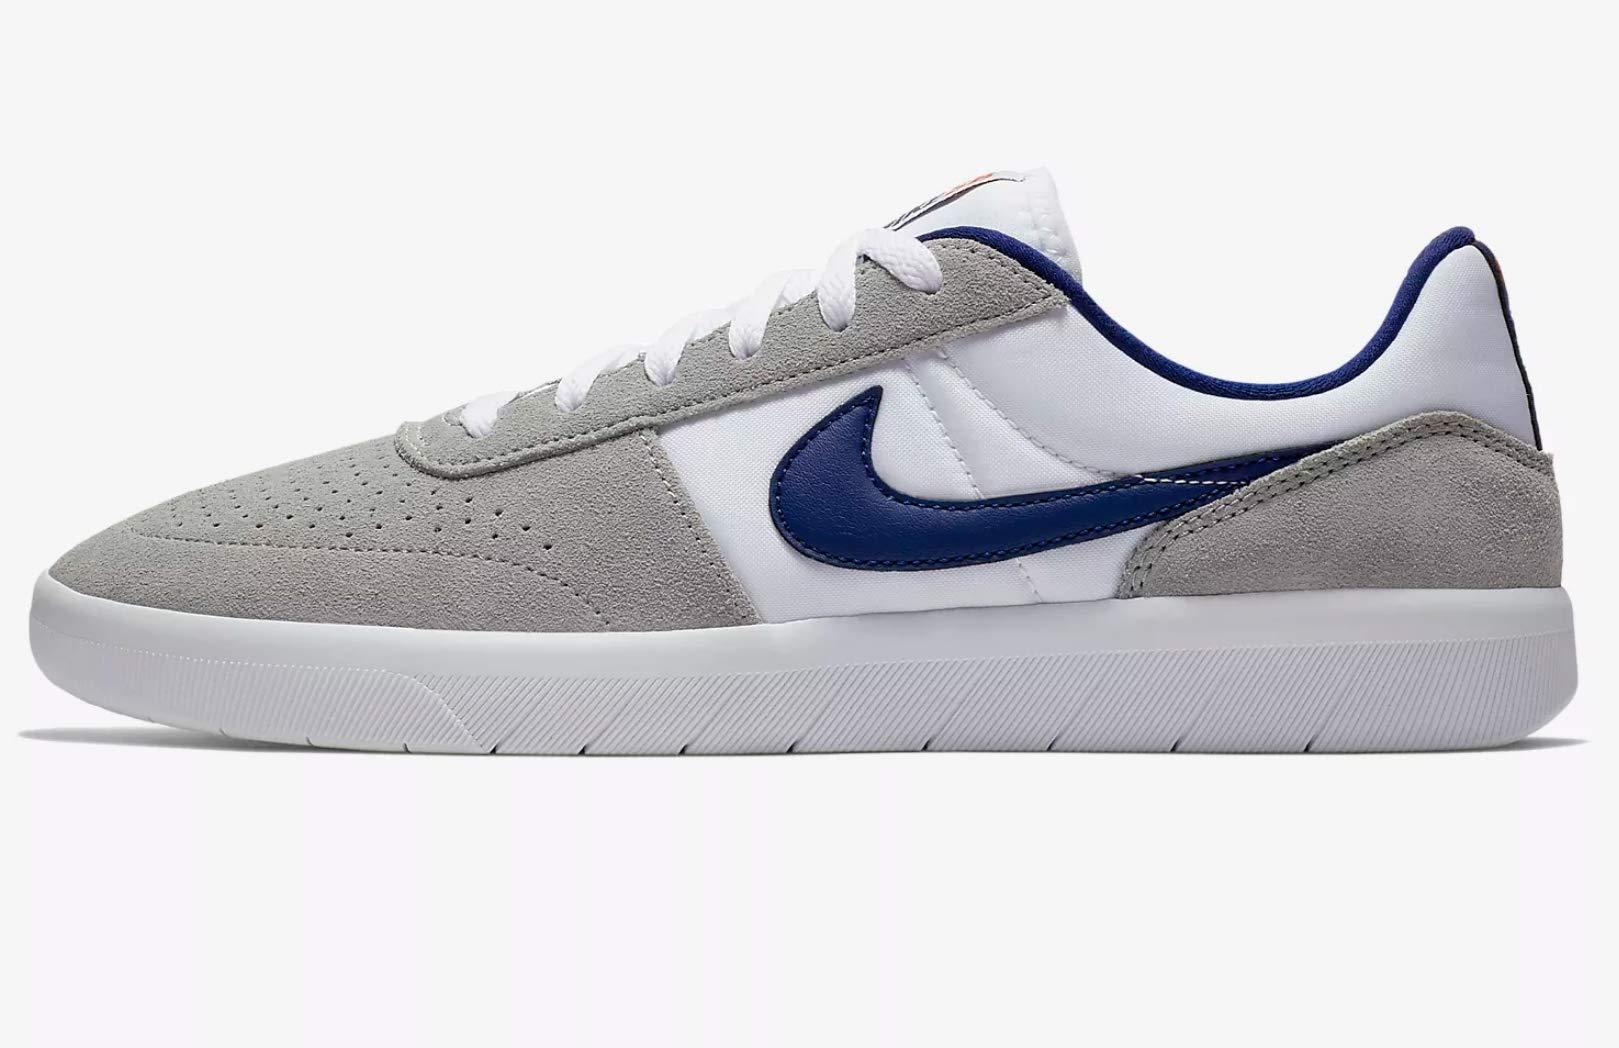 8b26c4f7a1cb Galleon - Nike Sb Team Classic Mens Ah3360-002 Size 5